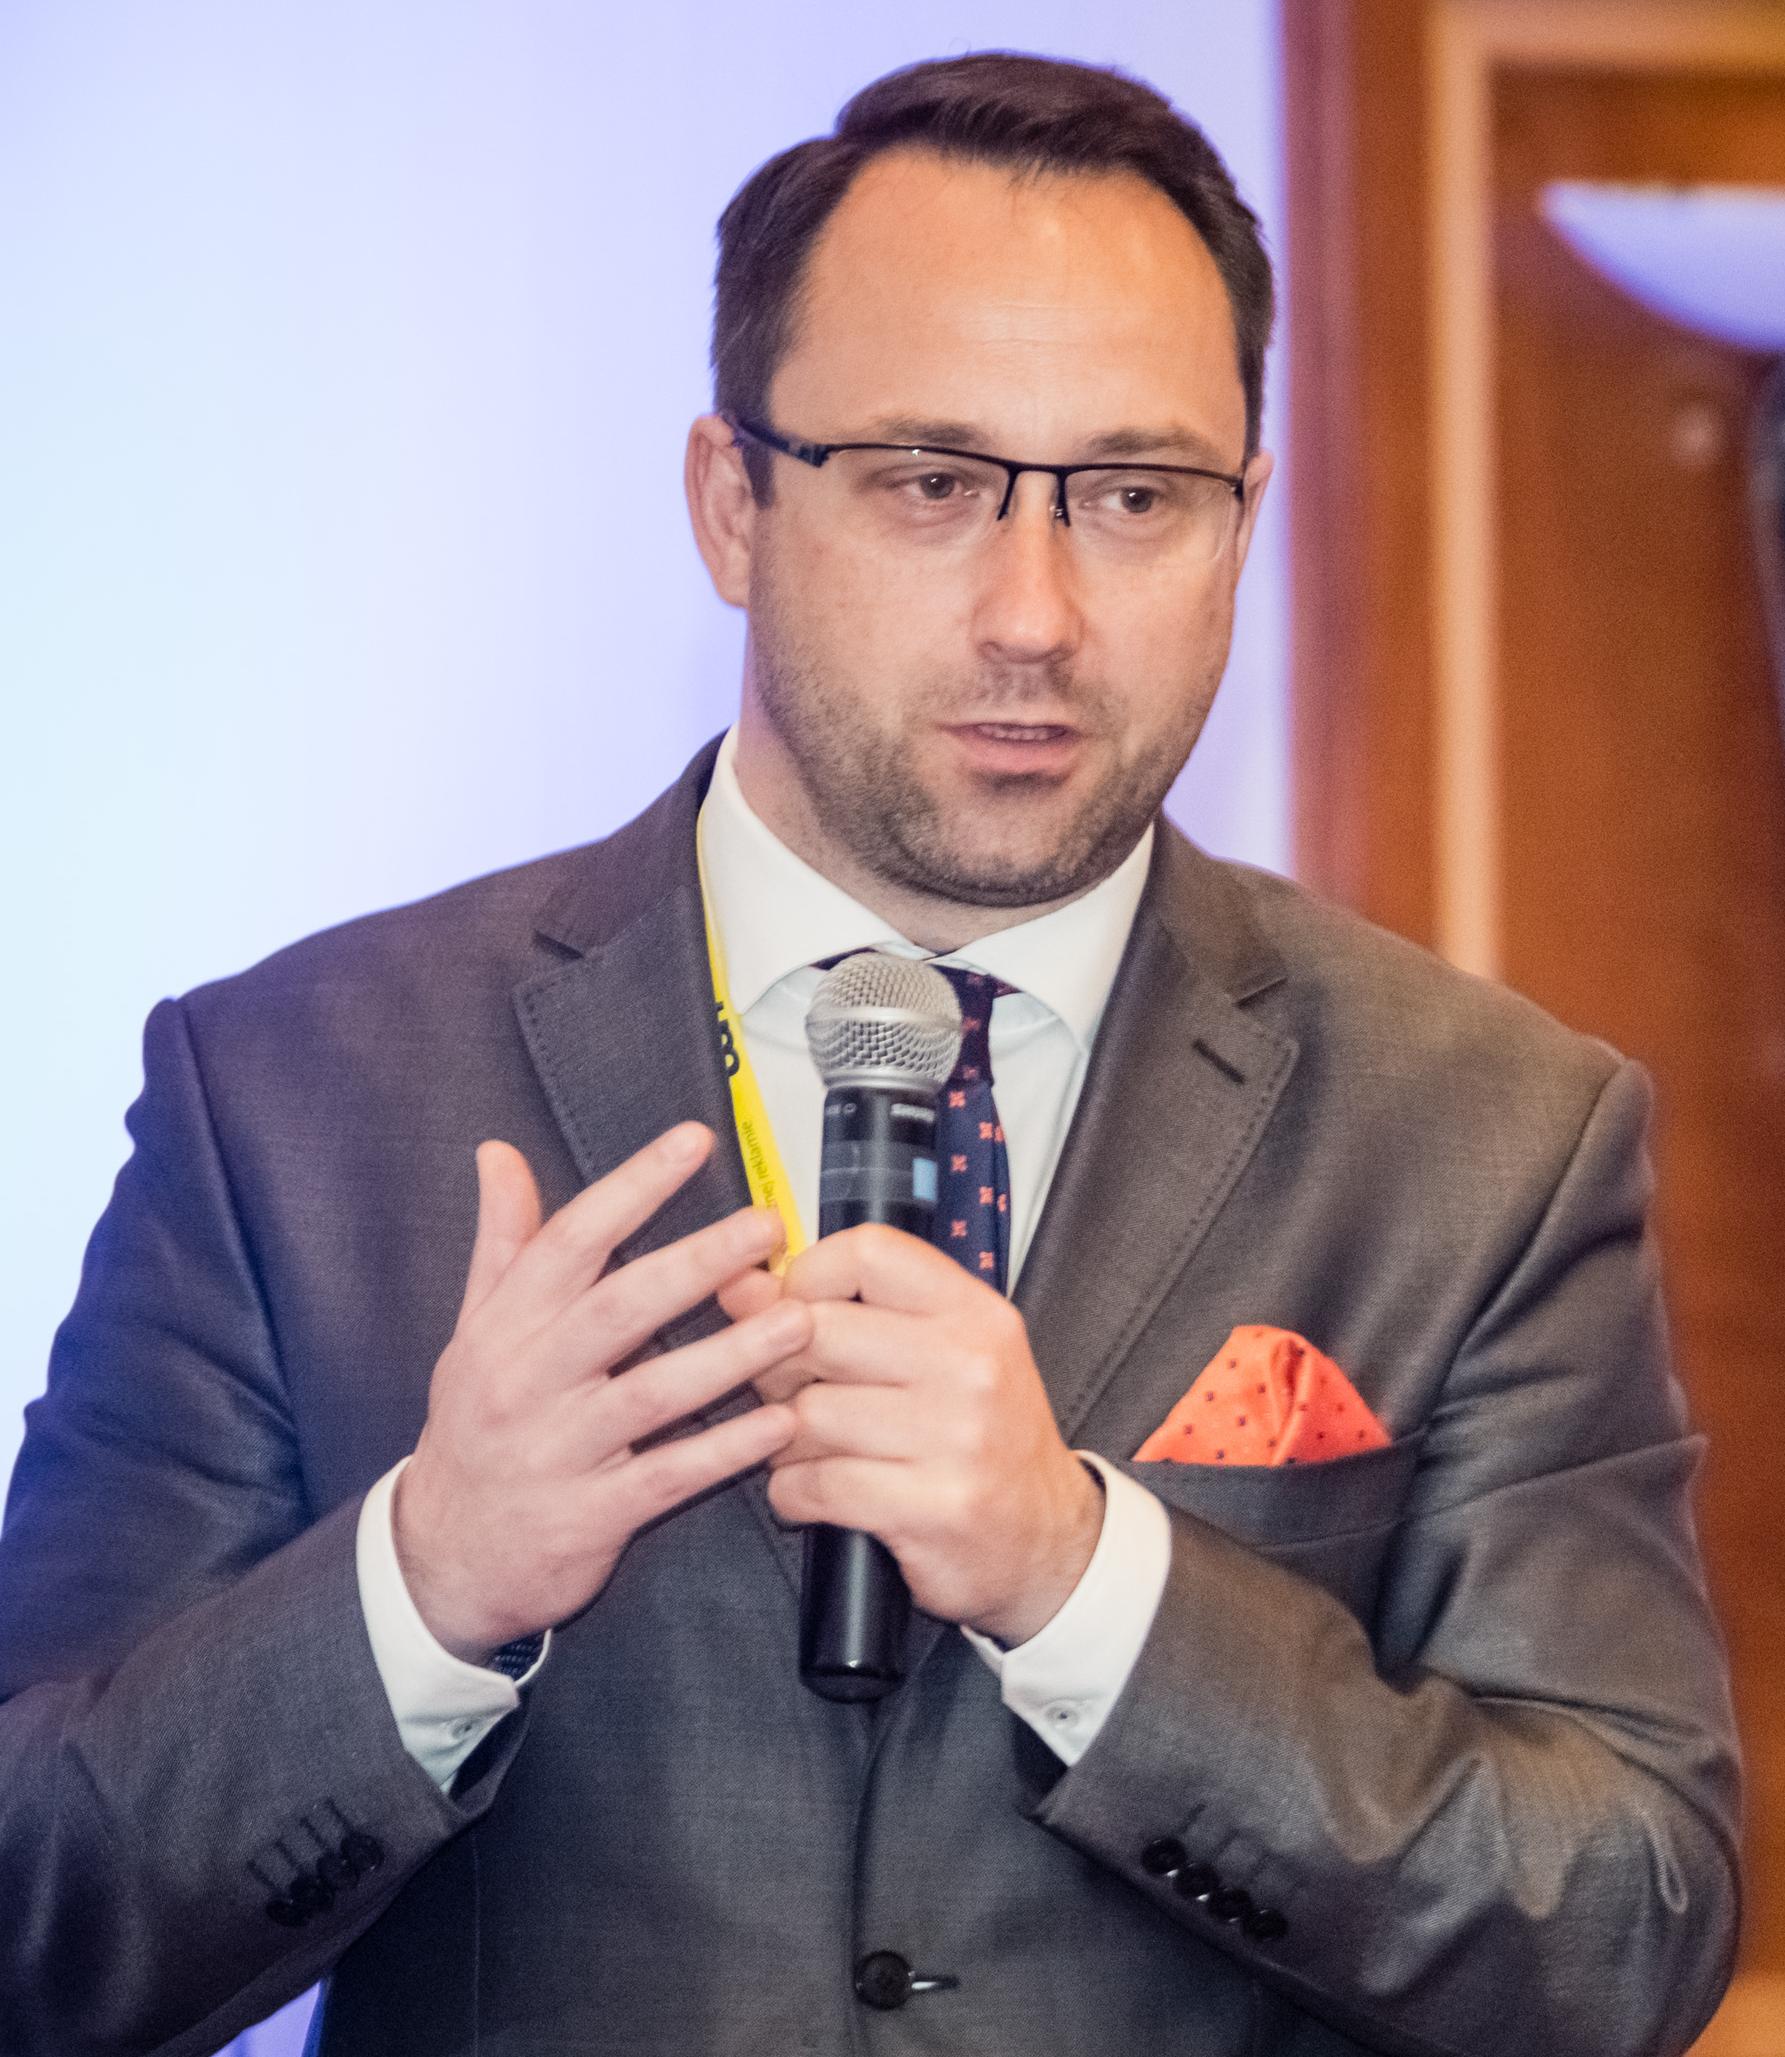 Marcin Chruściel